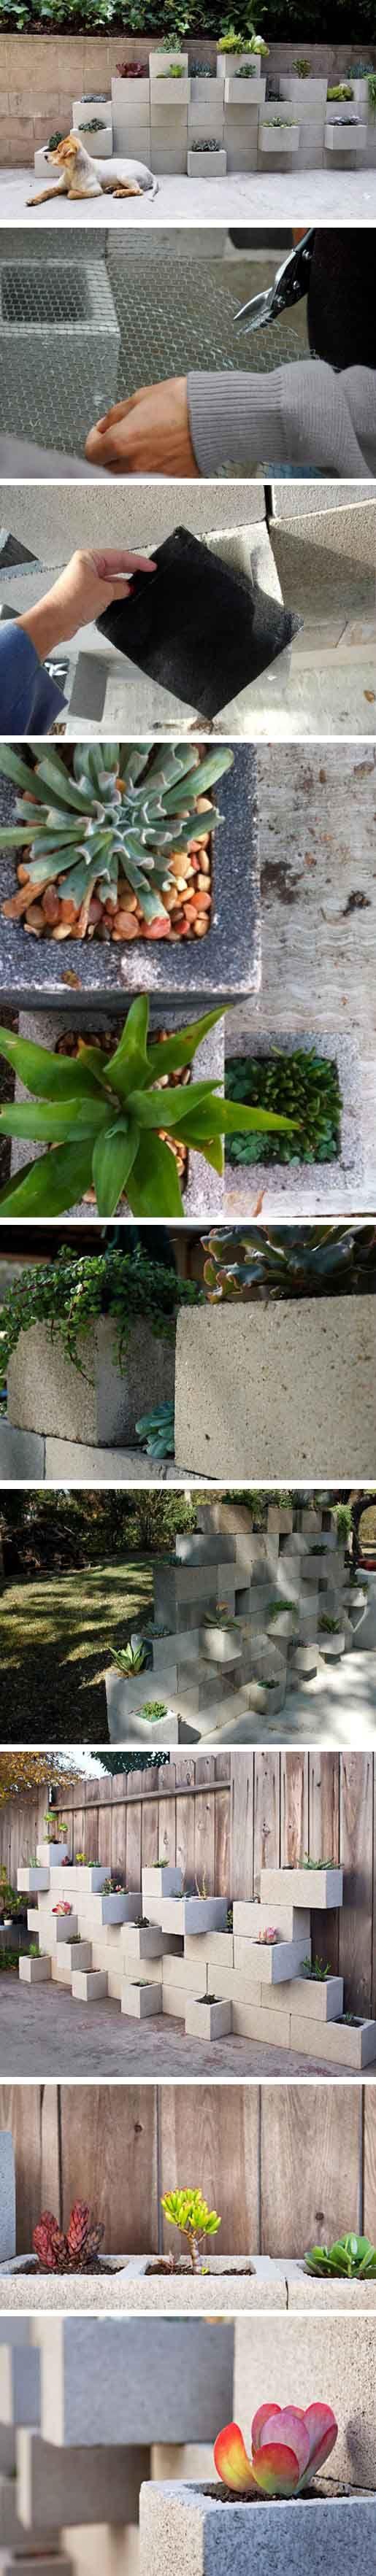 M s de 25 ideas incre bles sobre bloques de cemento en for Bloques de cemento para jardin